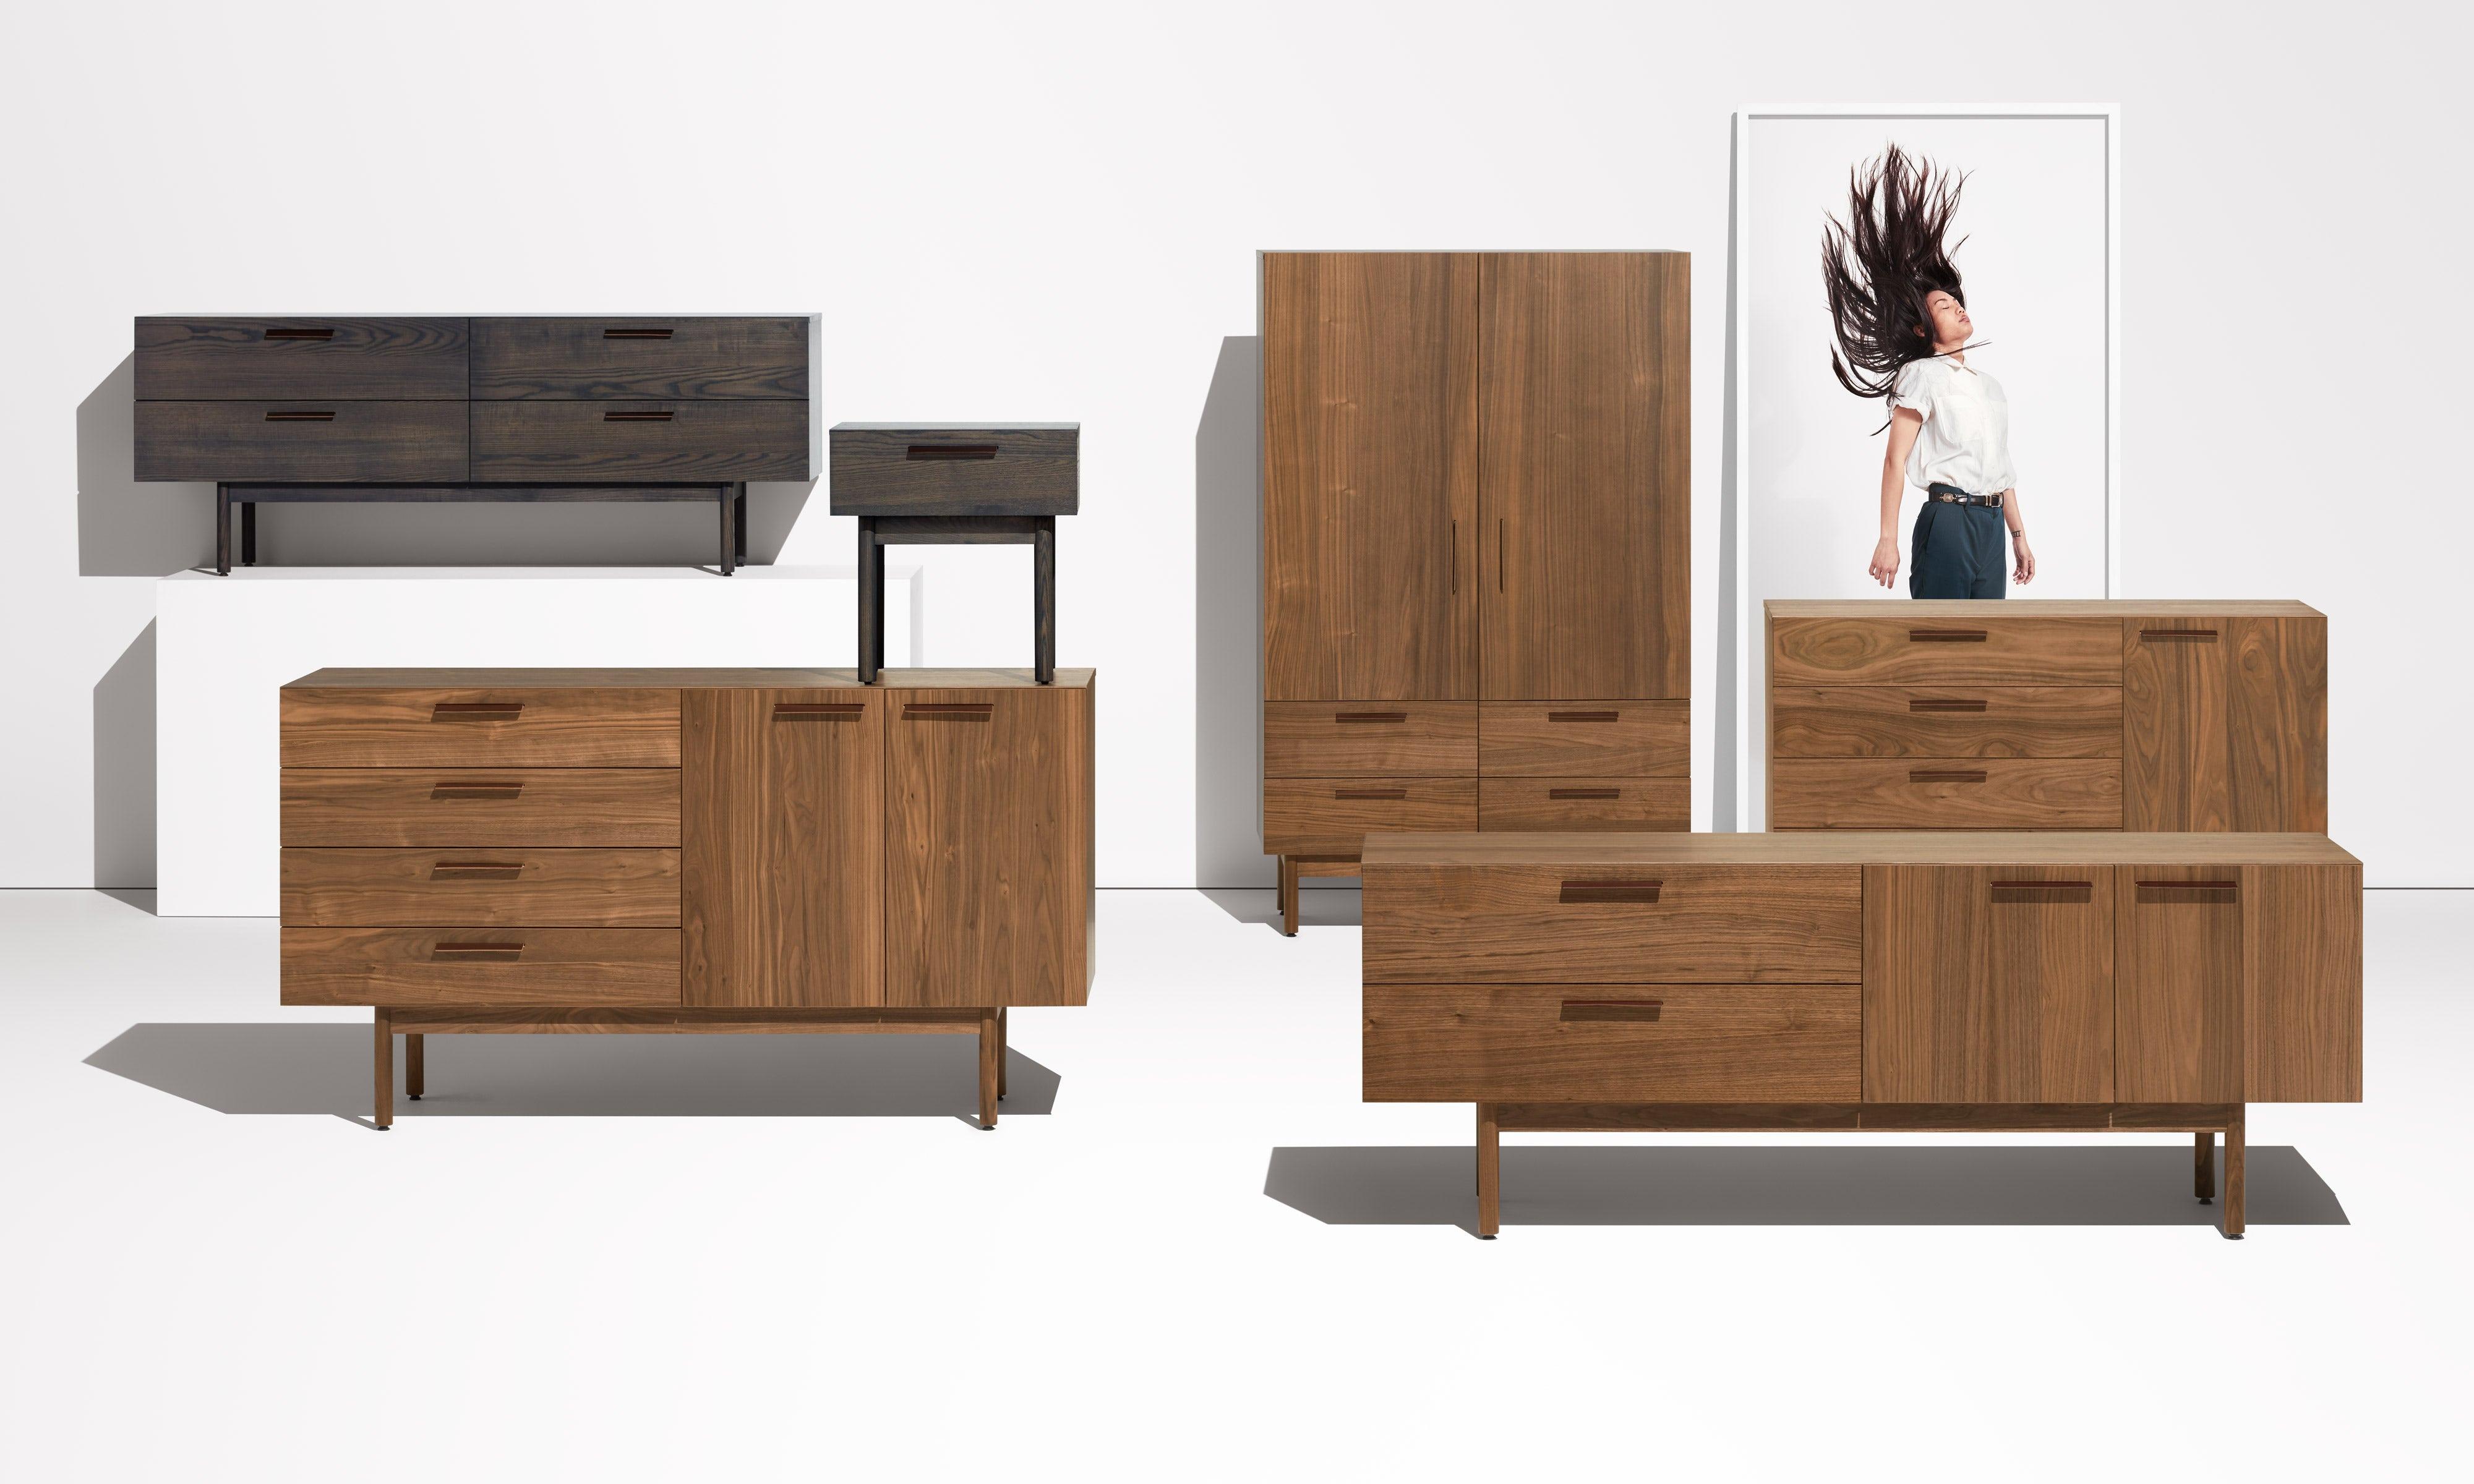 Shale Modern Wood Bedside Table by Blu Dot